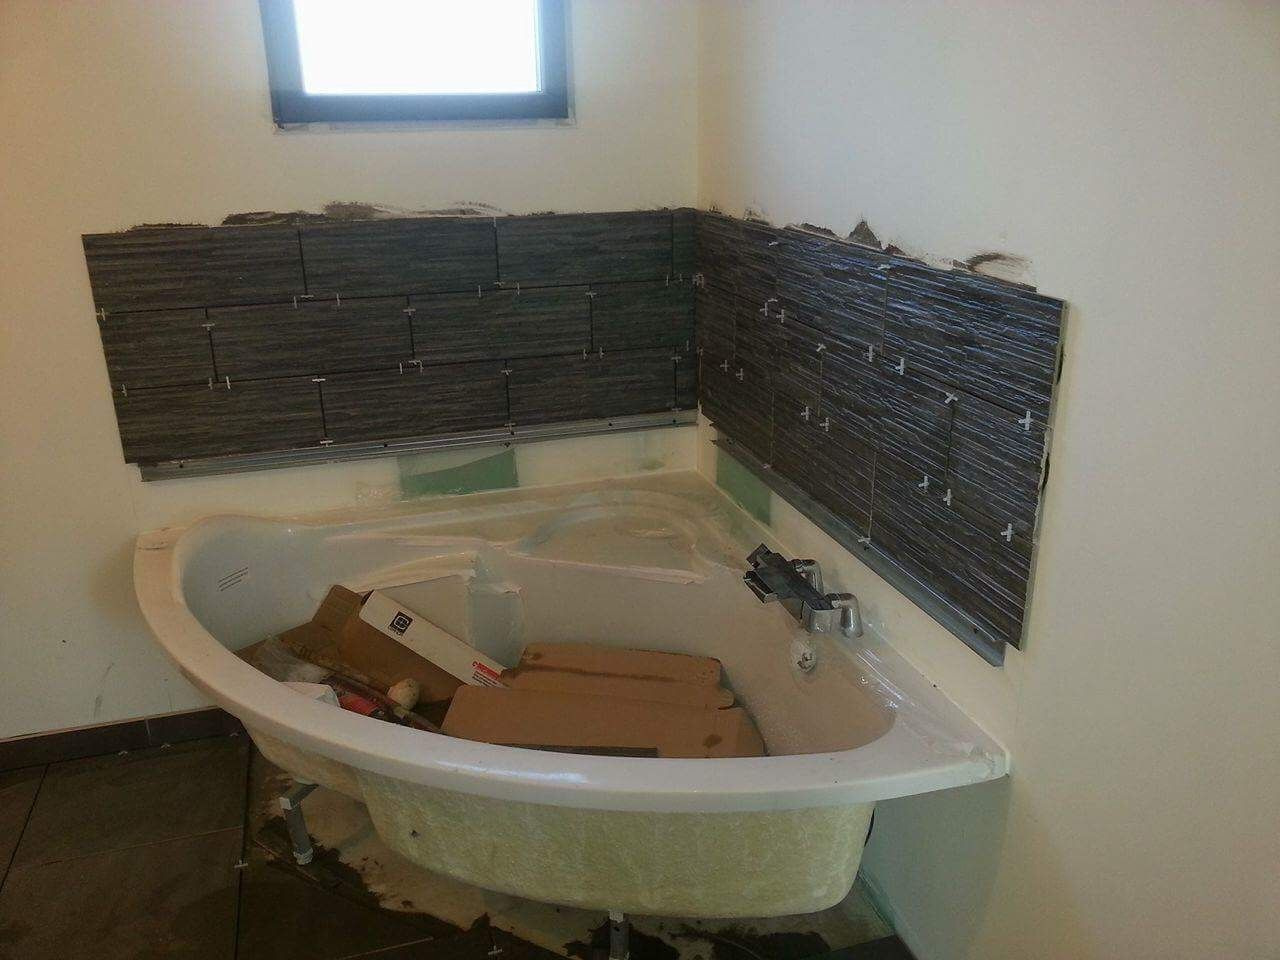 La Faience de la baignoire prend forme.